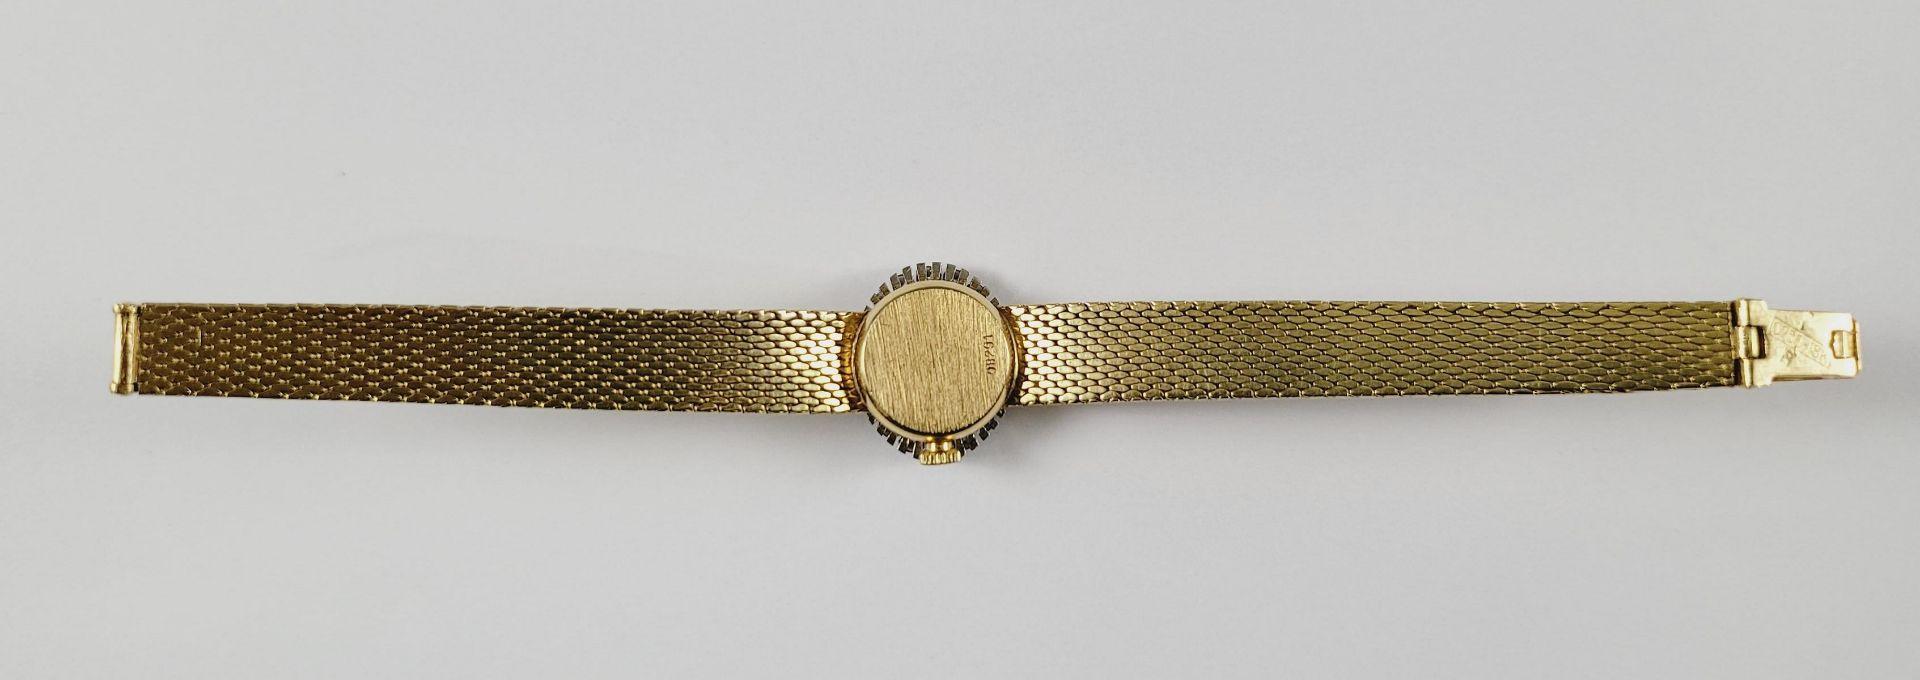 Damenarmbanduhr mit Diamanten, 18 Karat Gelbgold - Bild 3 aus 4